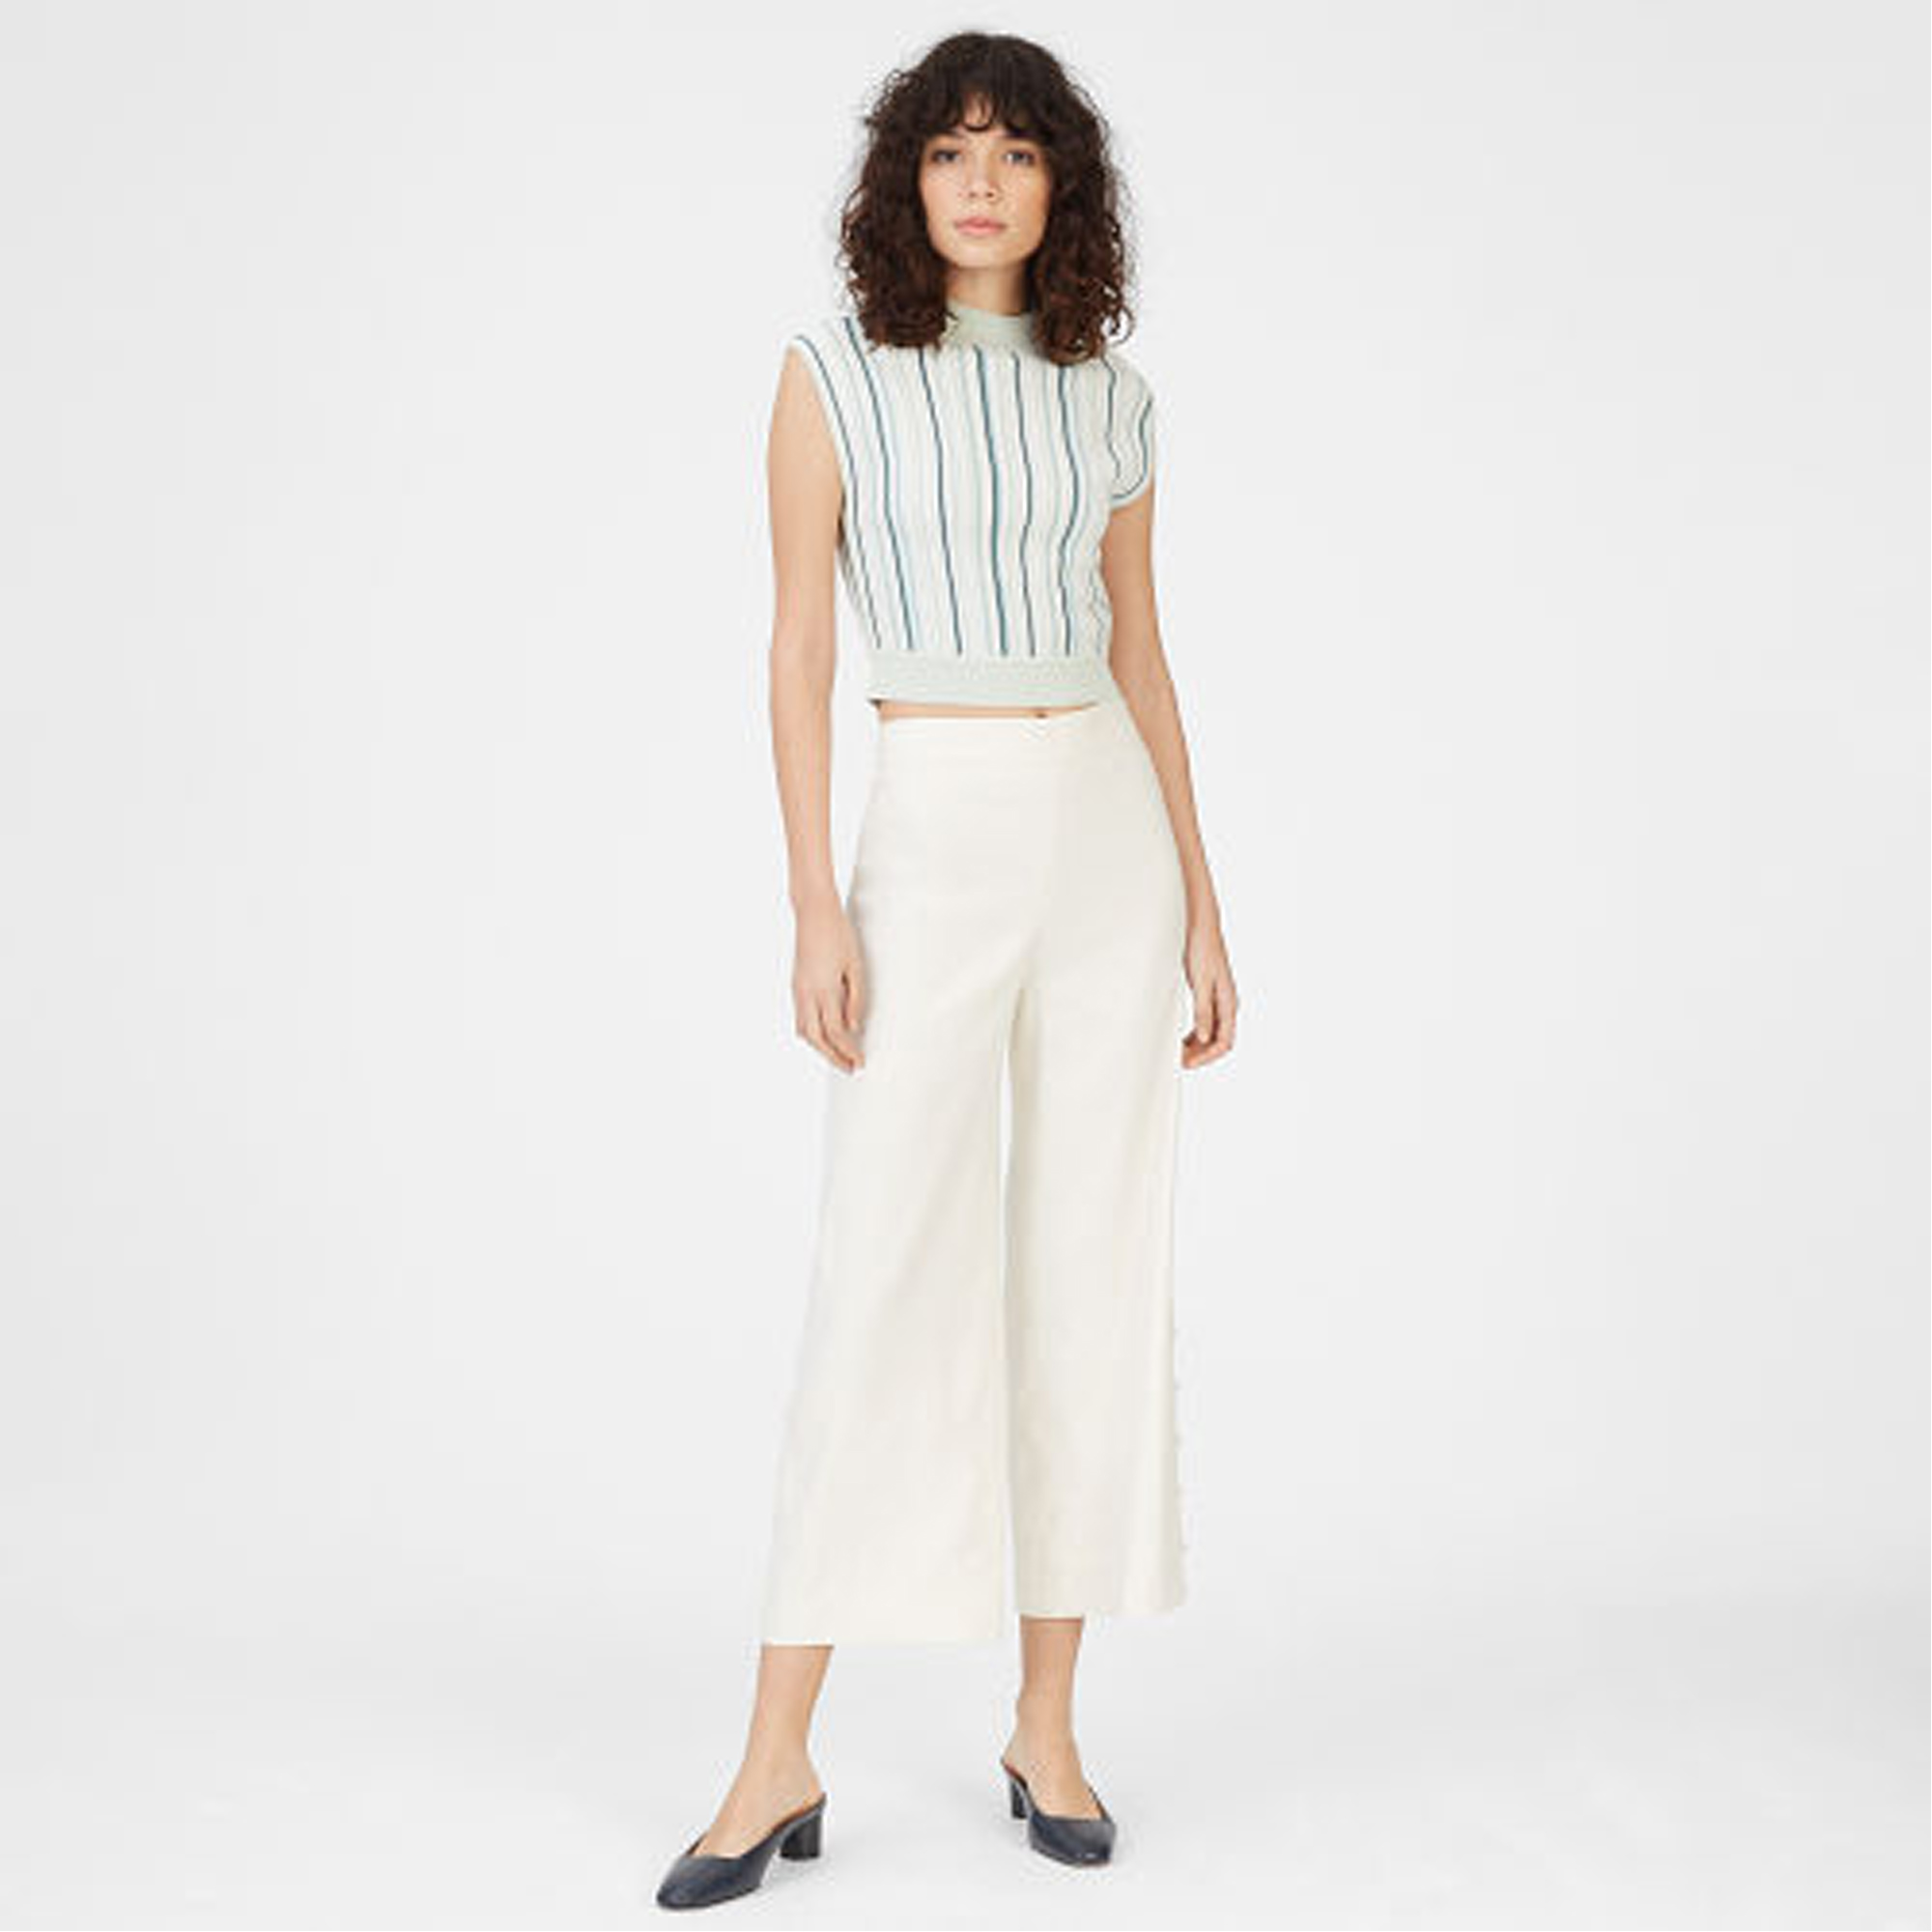 Shiresah Sweater   HK$1,690